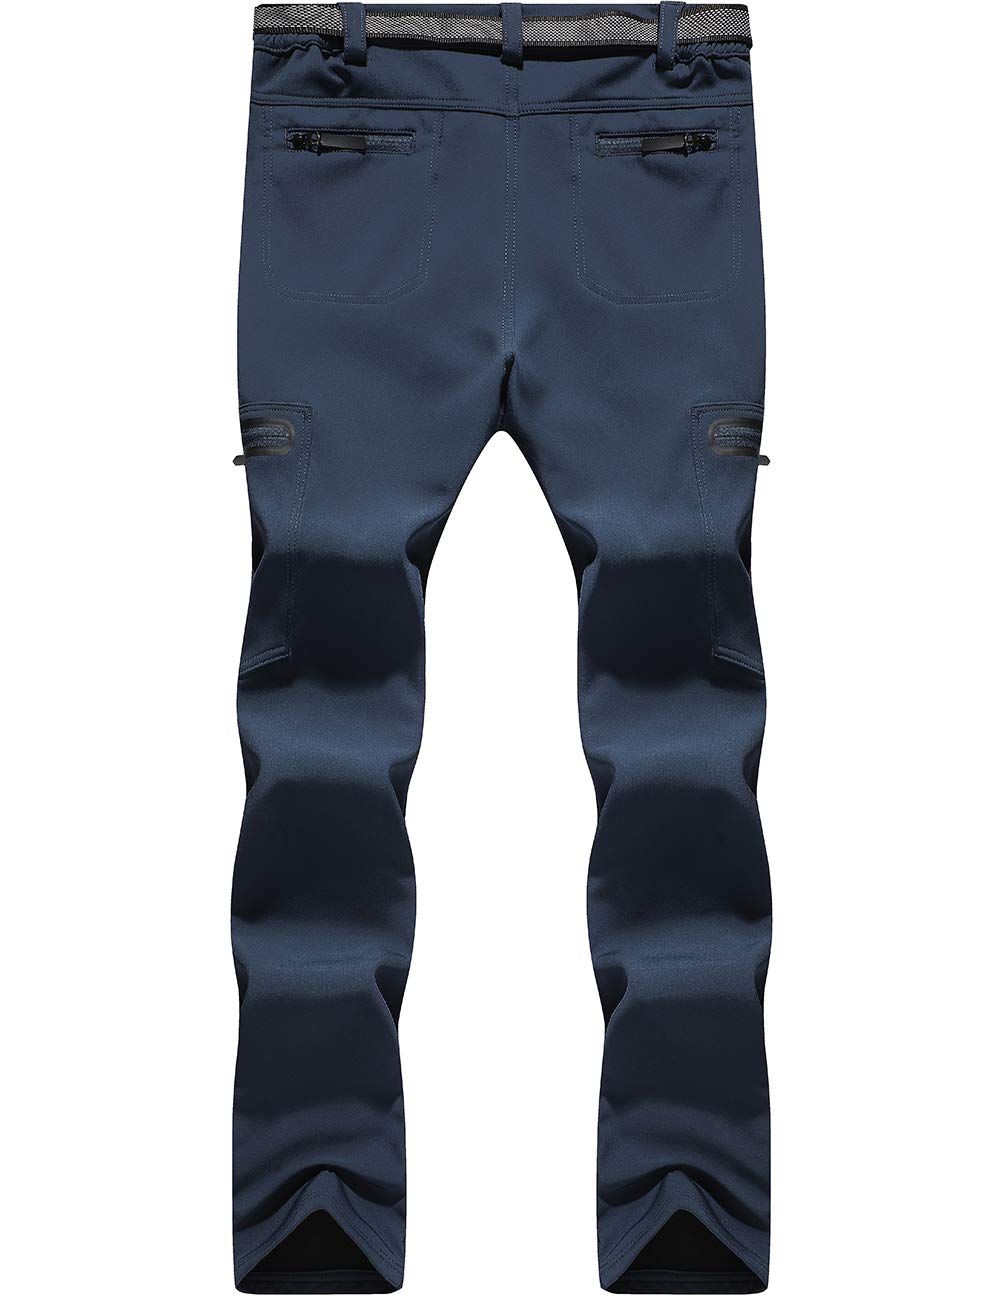 DENGBOSN Donna Pantaloni Trekking Invernali Impermeabile Pantaloni Softshell Caldo Outdoor Pantaloni da Escursionismo Arrampicata